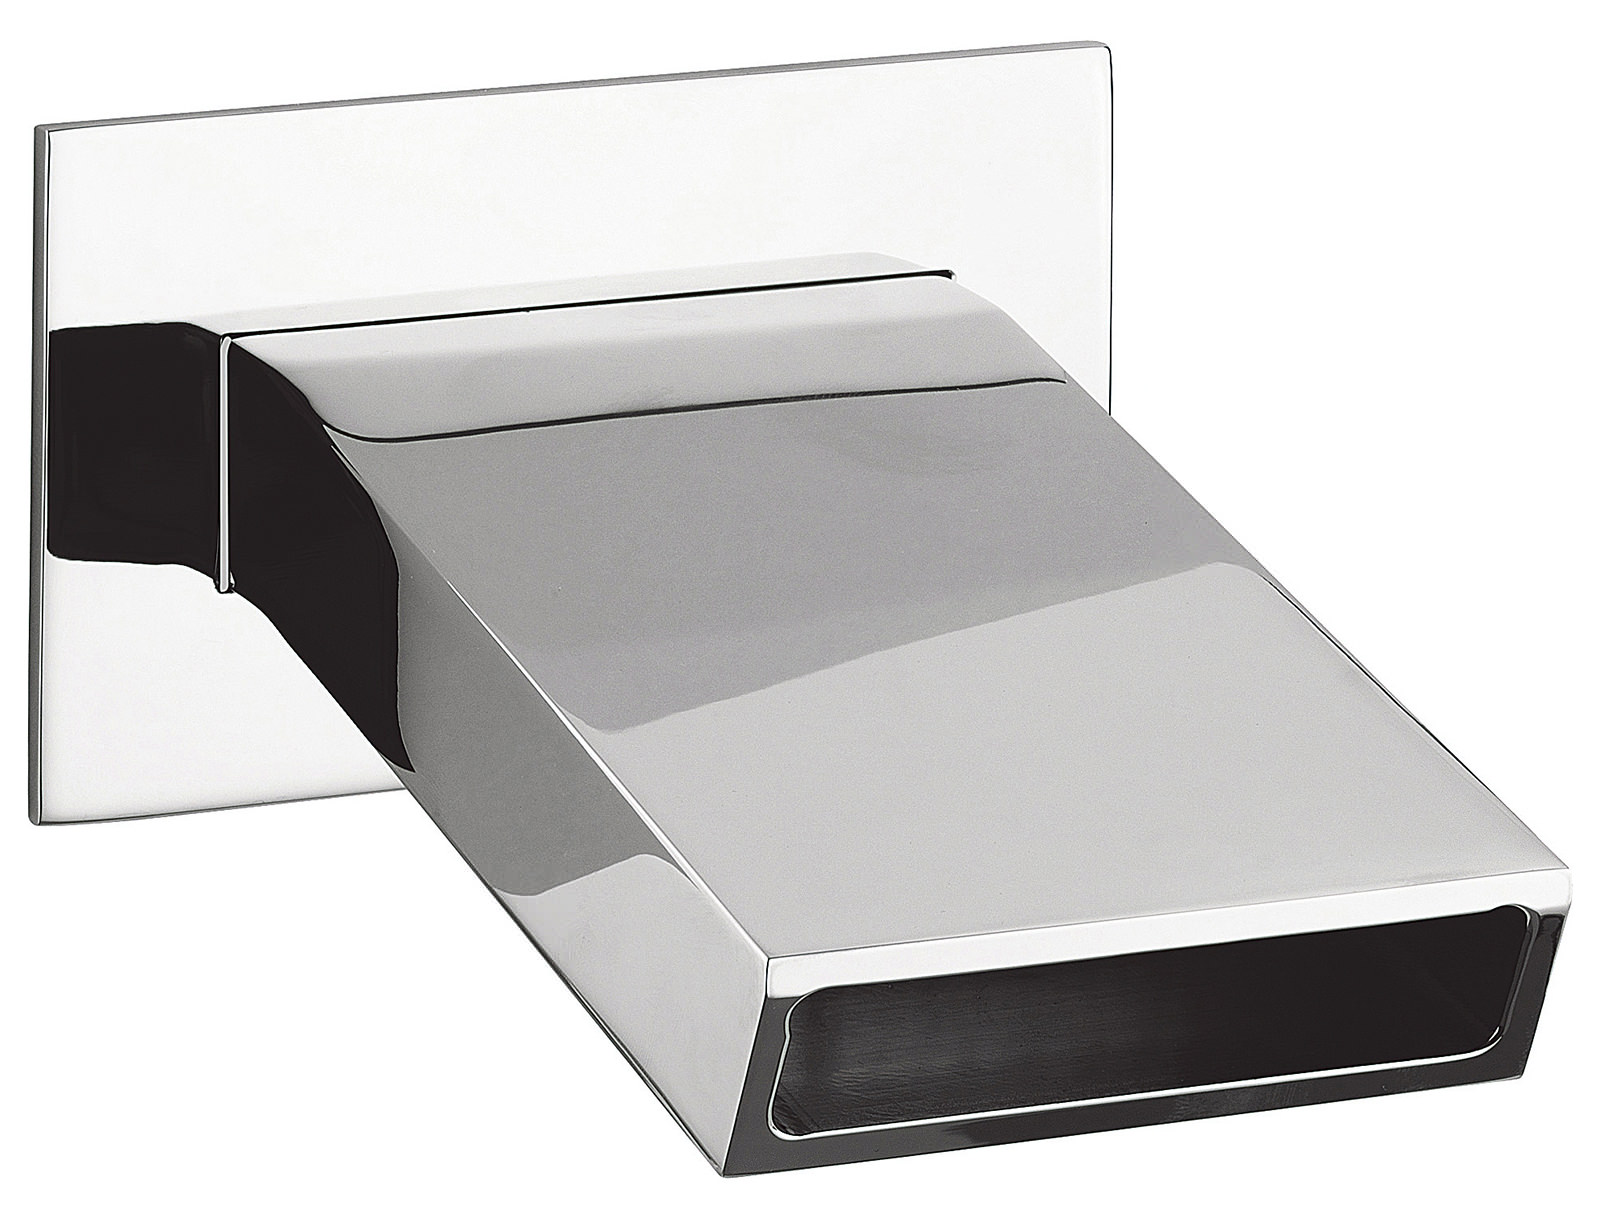 crosswater slip wall mounted bath filler spout sp0370wc